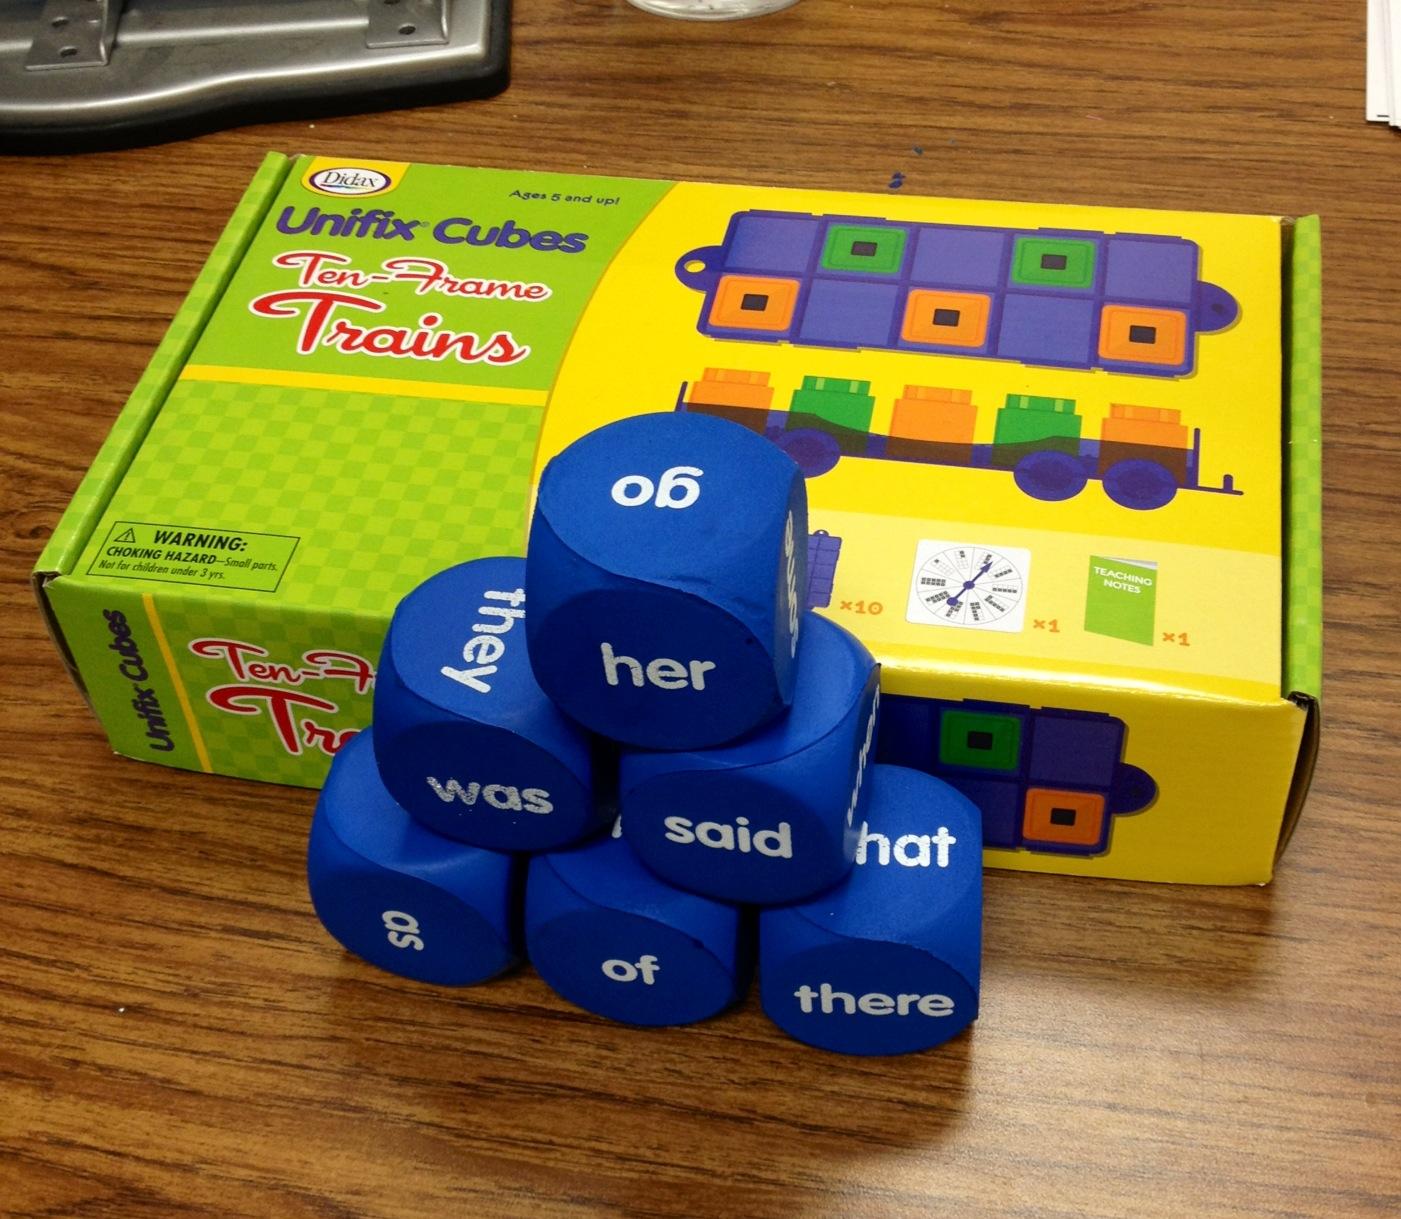 Susan Jones Teaching 10 S Frame Trains Amp Sight Word Cubes Mpm Supplies